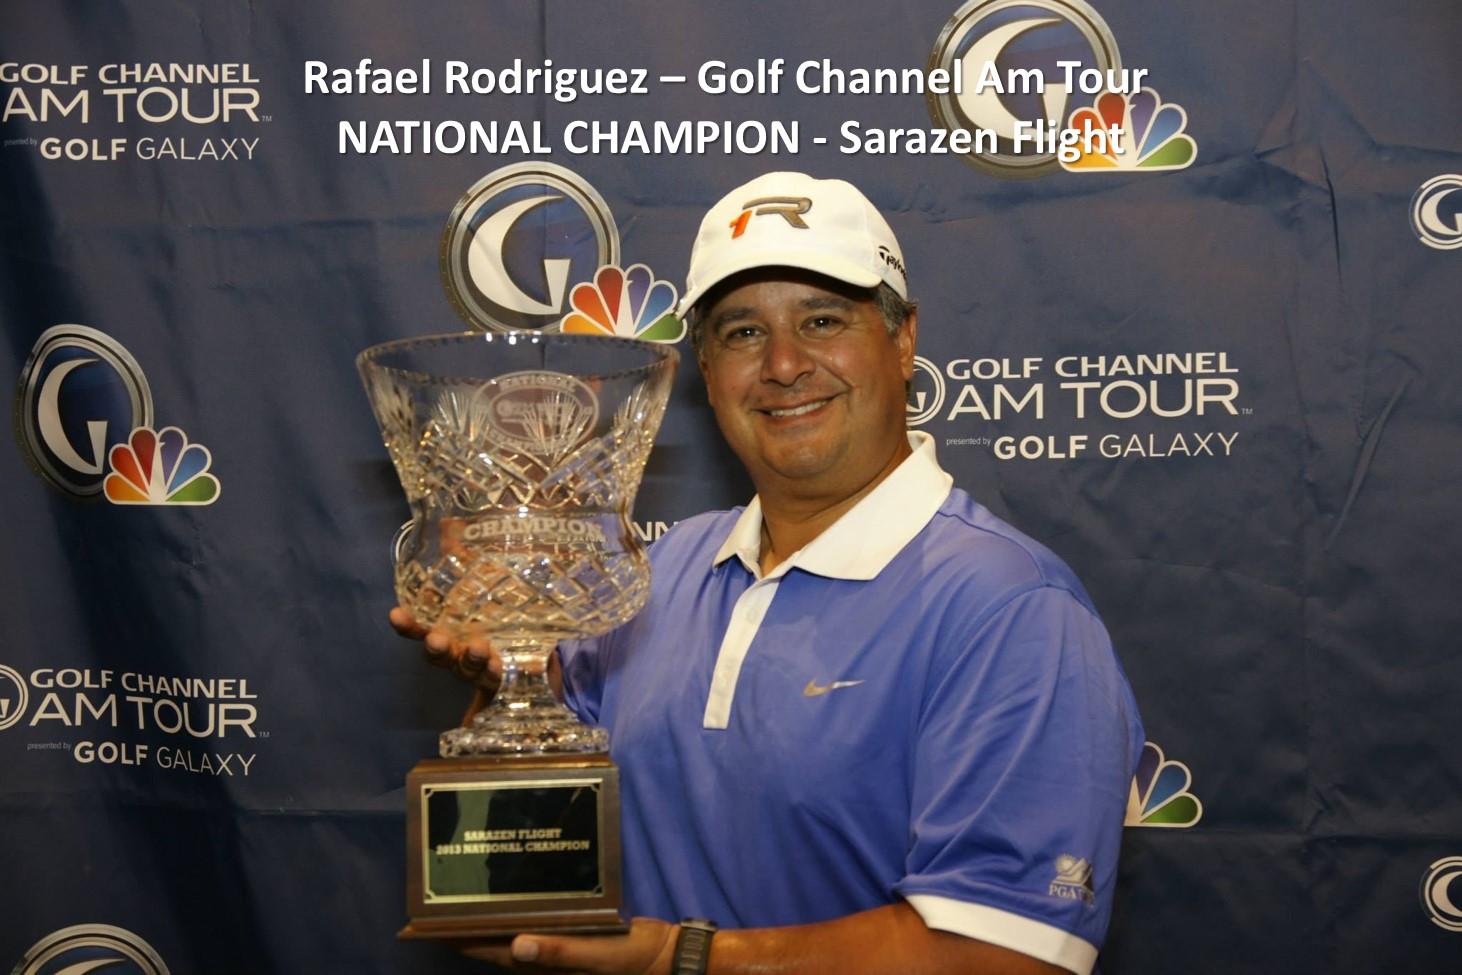 Congratulations, Rafael!